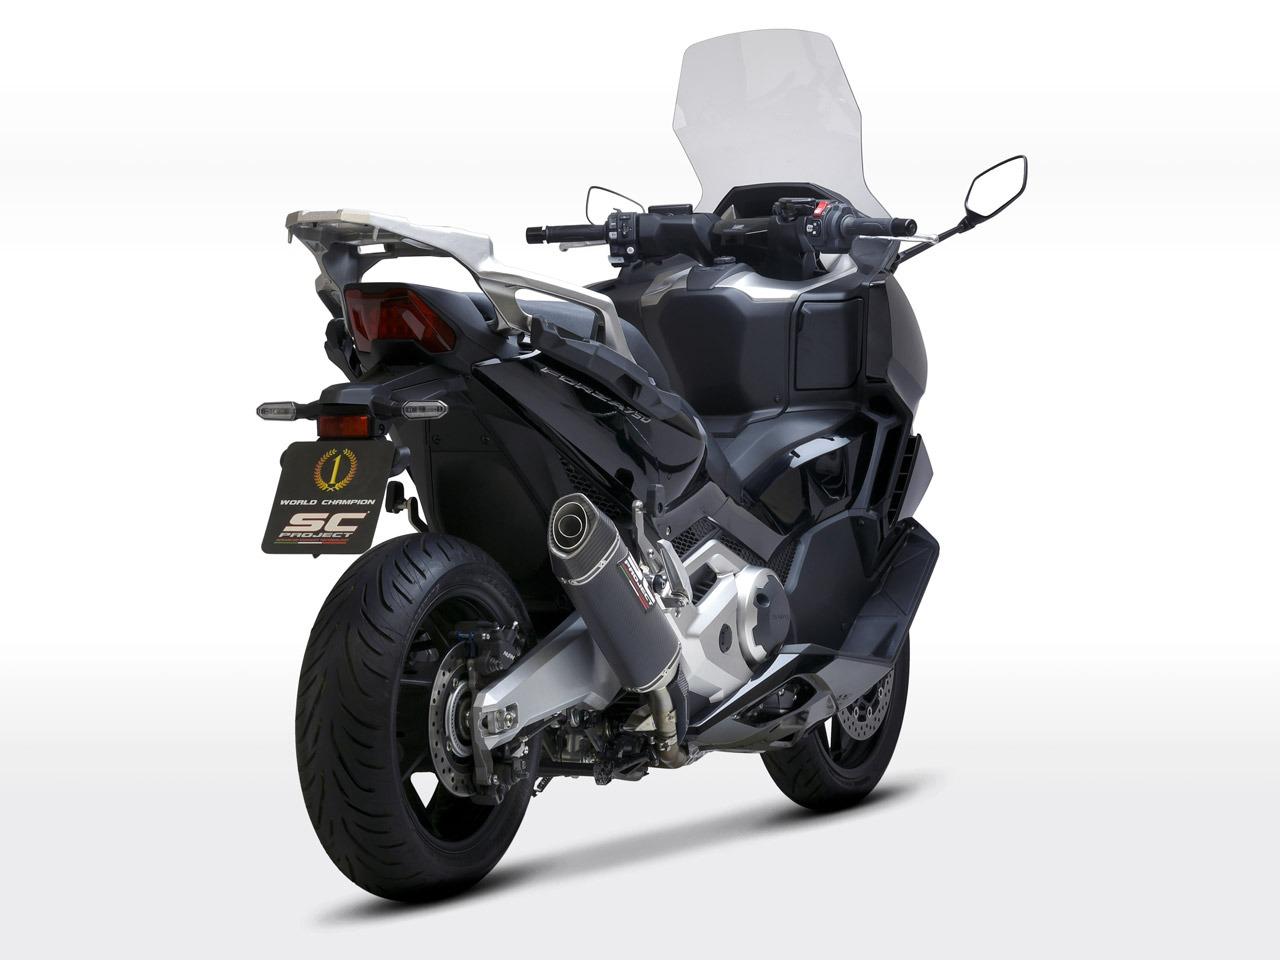 Honda_Forza750_my2021_SC1S-Carbonio_Posteriore_1280x960px_web-partnership